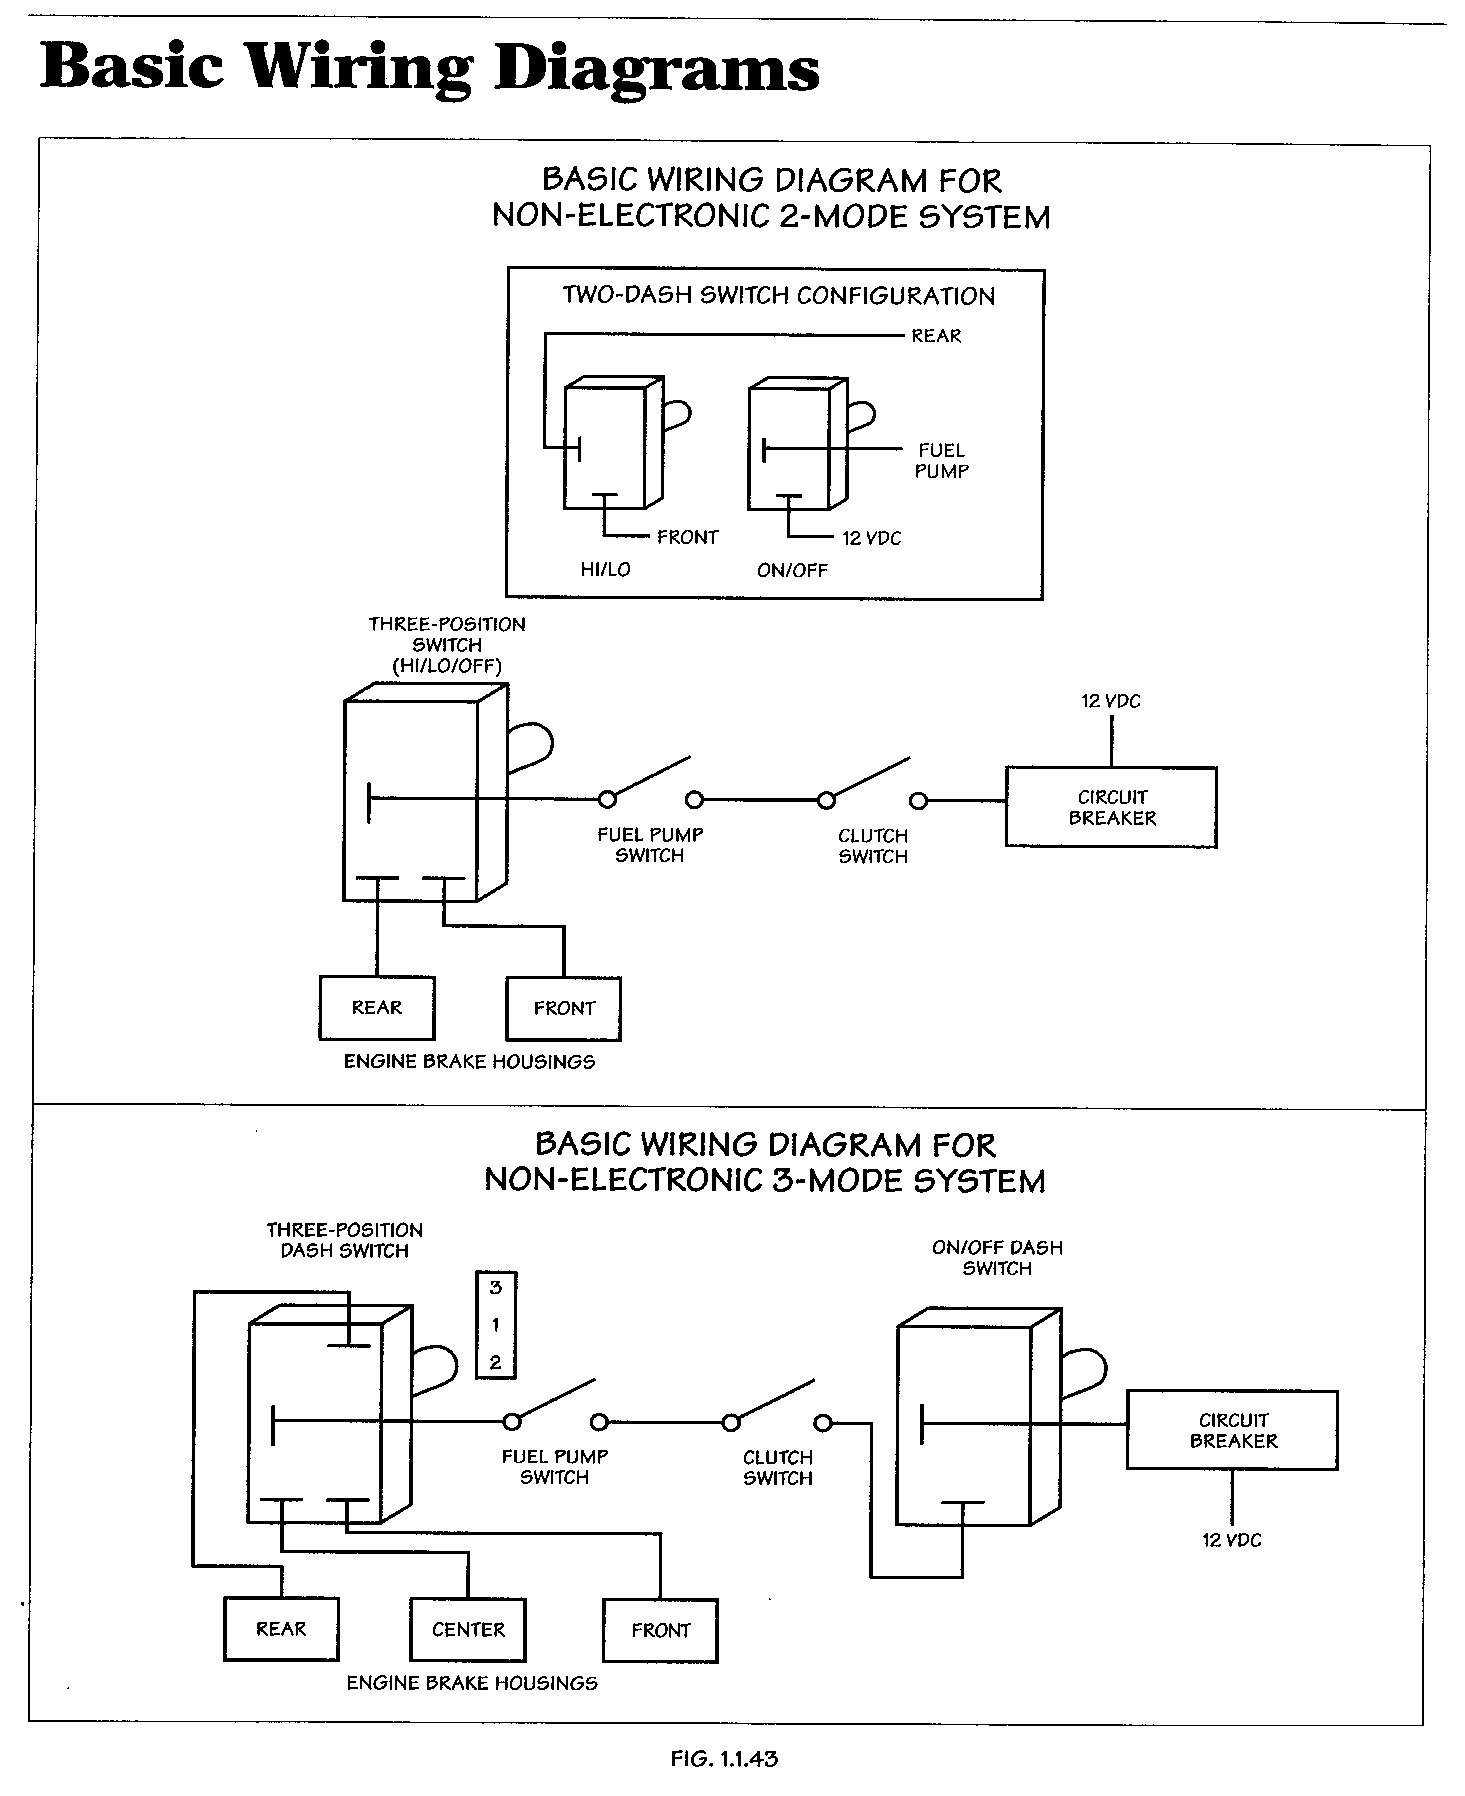 Mack Jake Brake Wiring Diagram Freightliner Jake Brake Wiring Diagram Of Mack Jake Brake Wiring Diagram